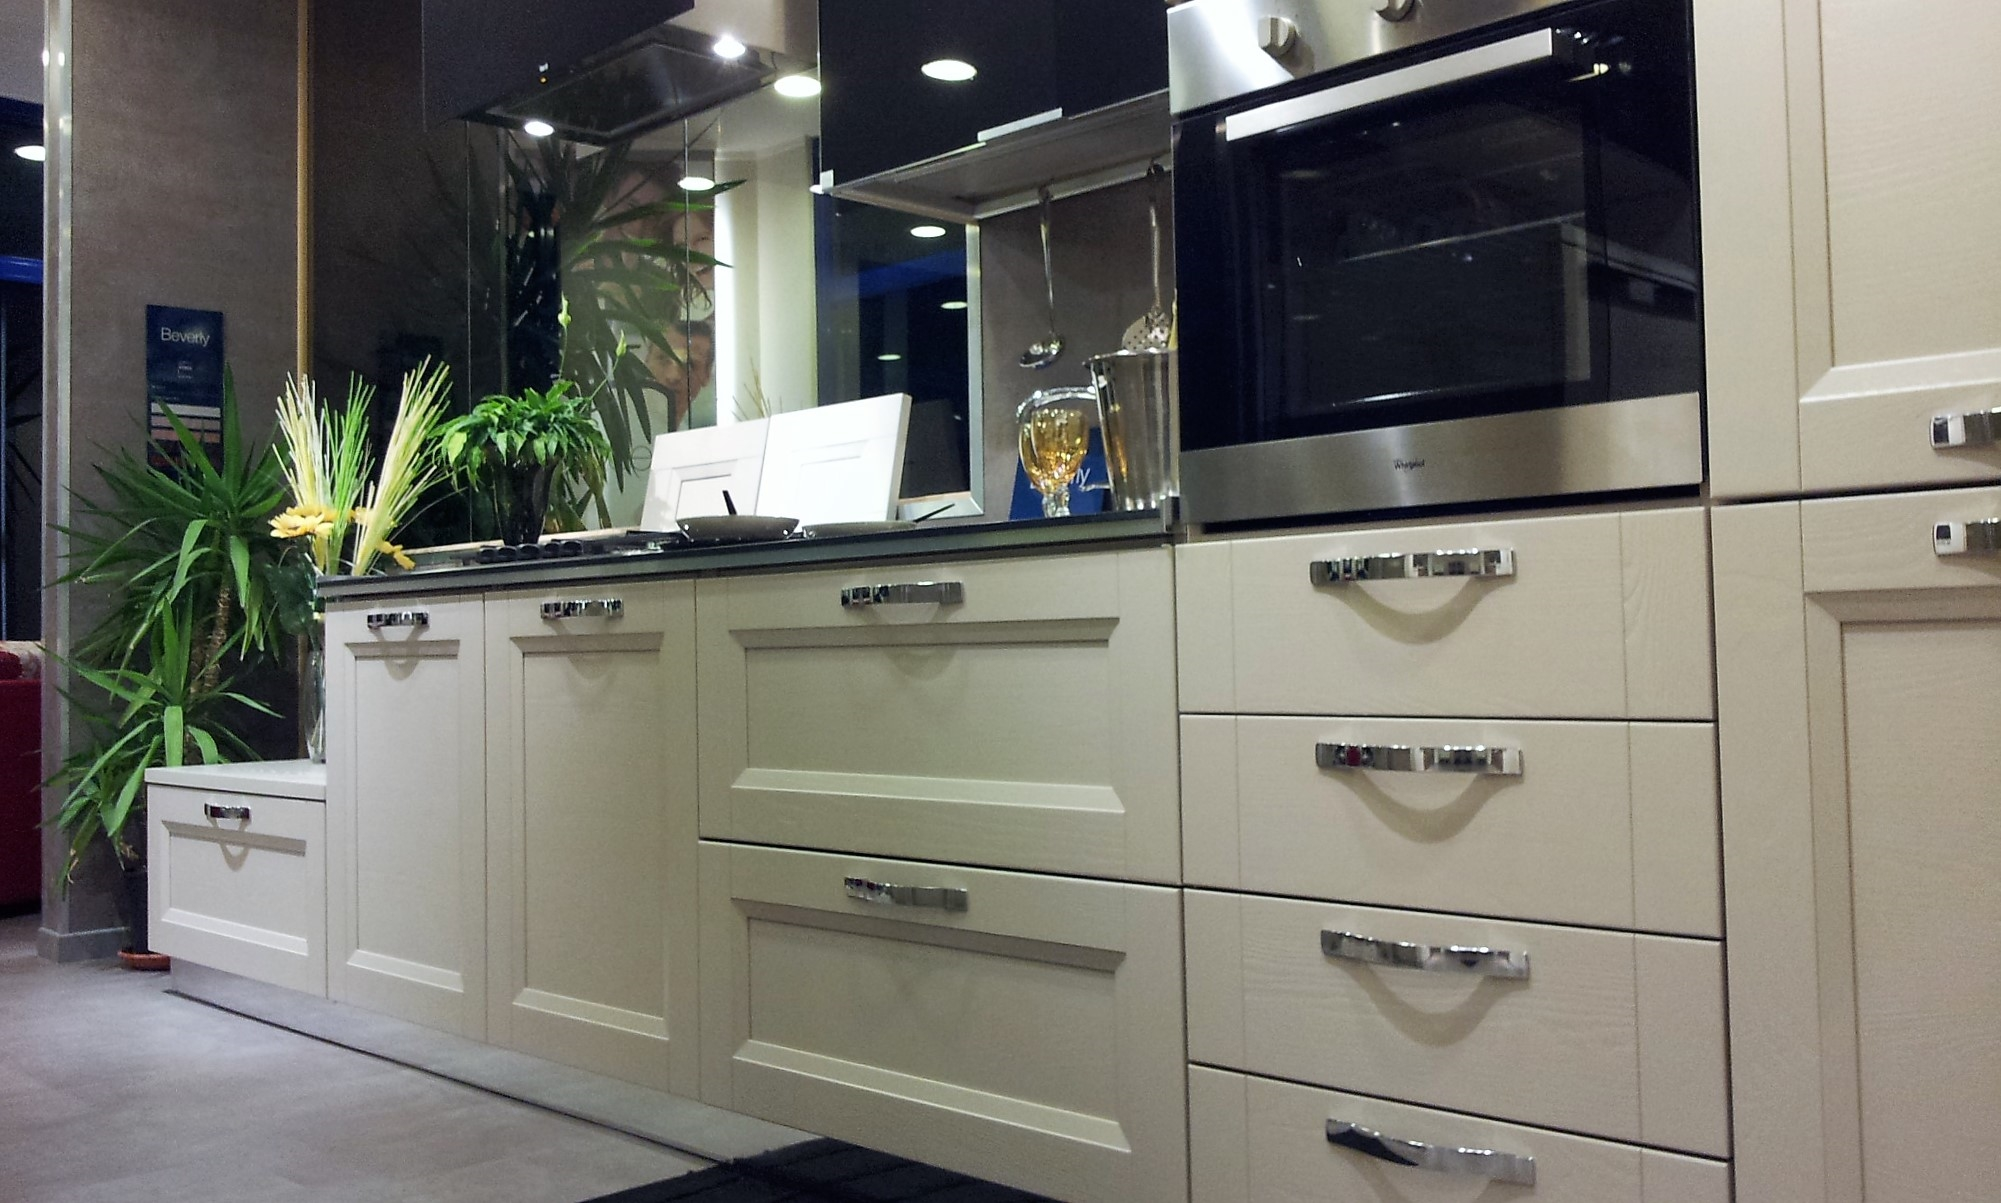 cucina stosa cucine beverly canapa scontato del -61 % - cucine a ... - Cucine Stosa Beverly